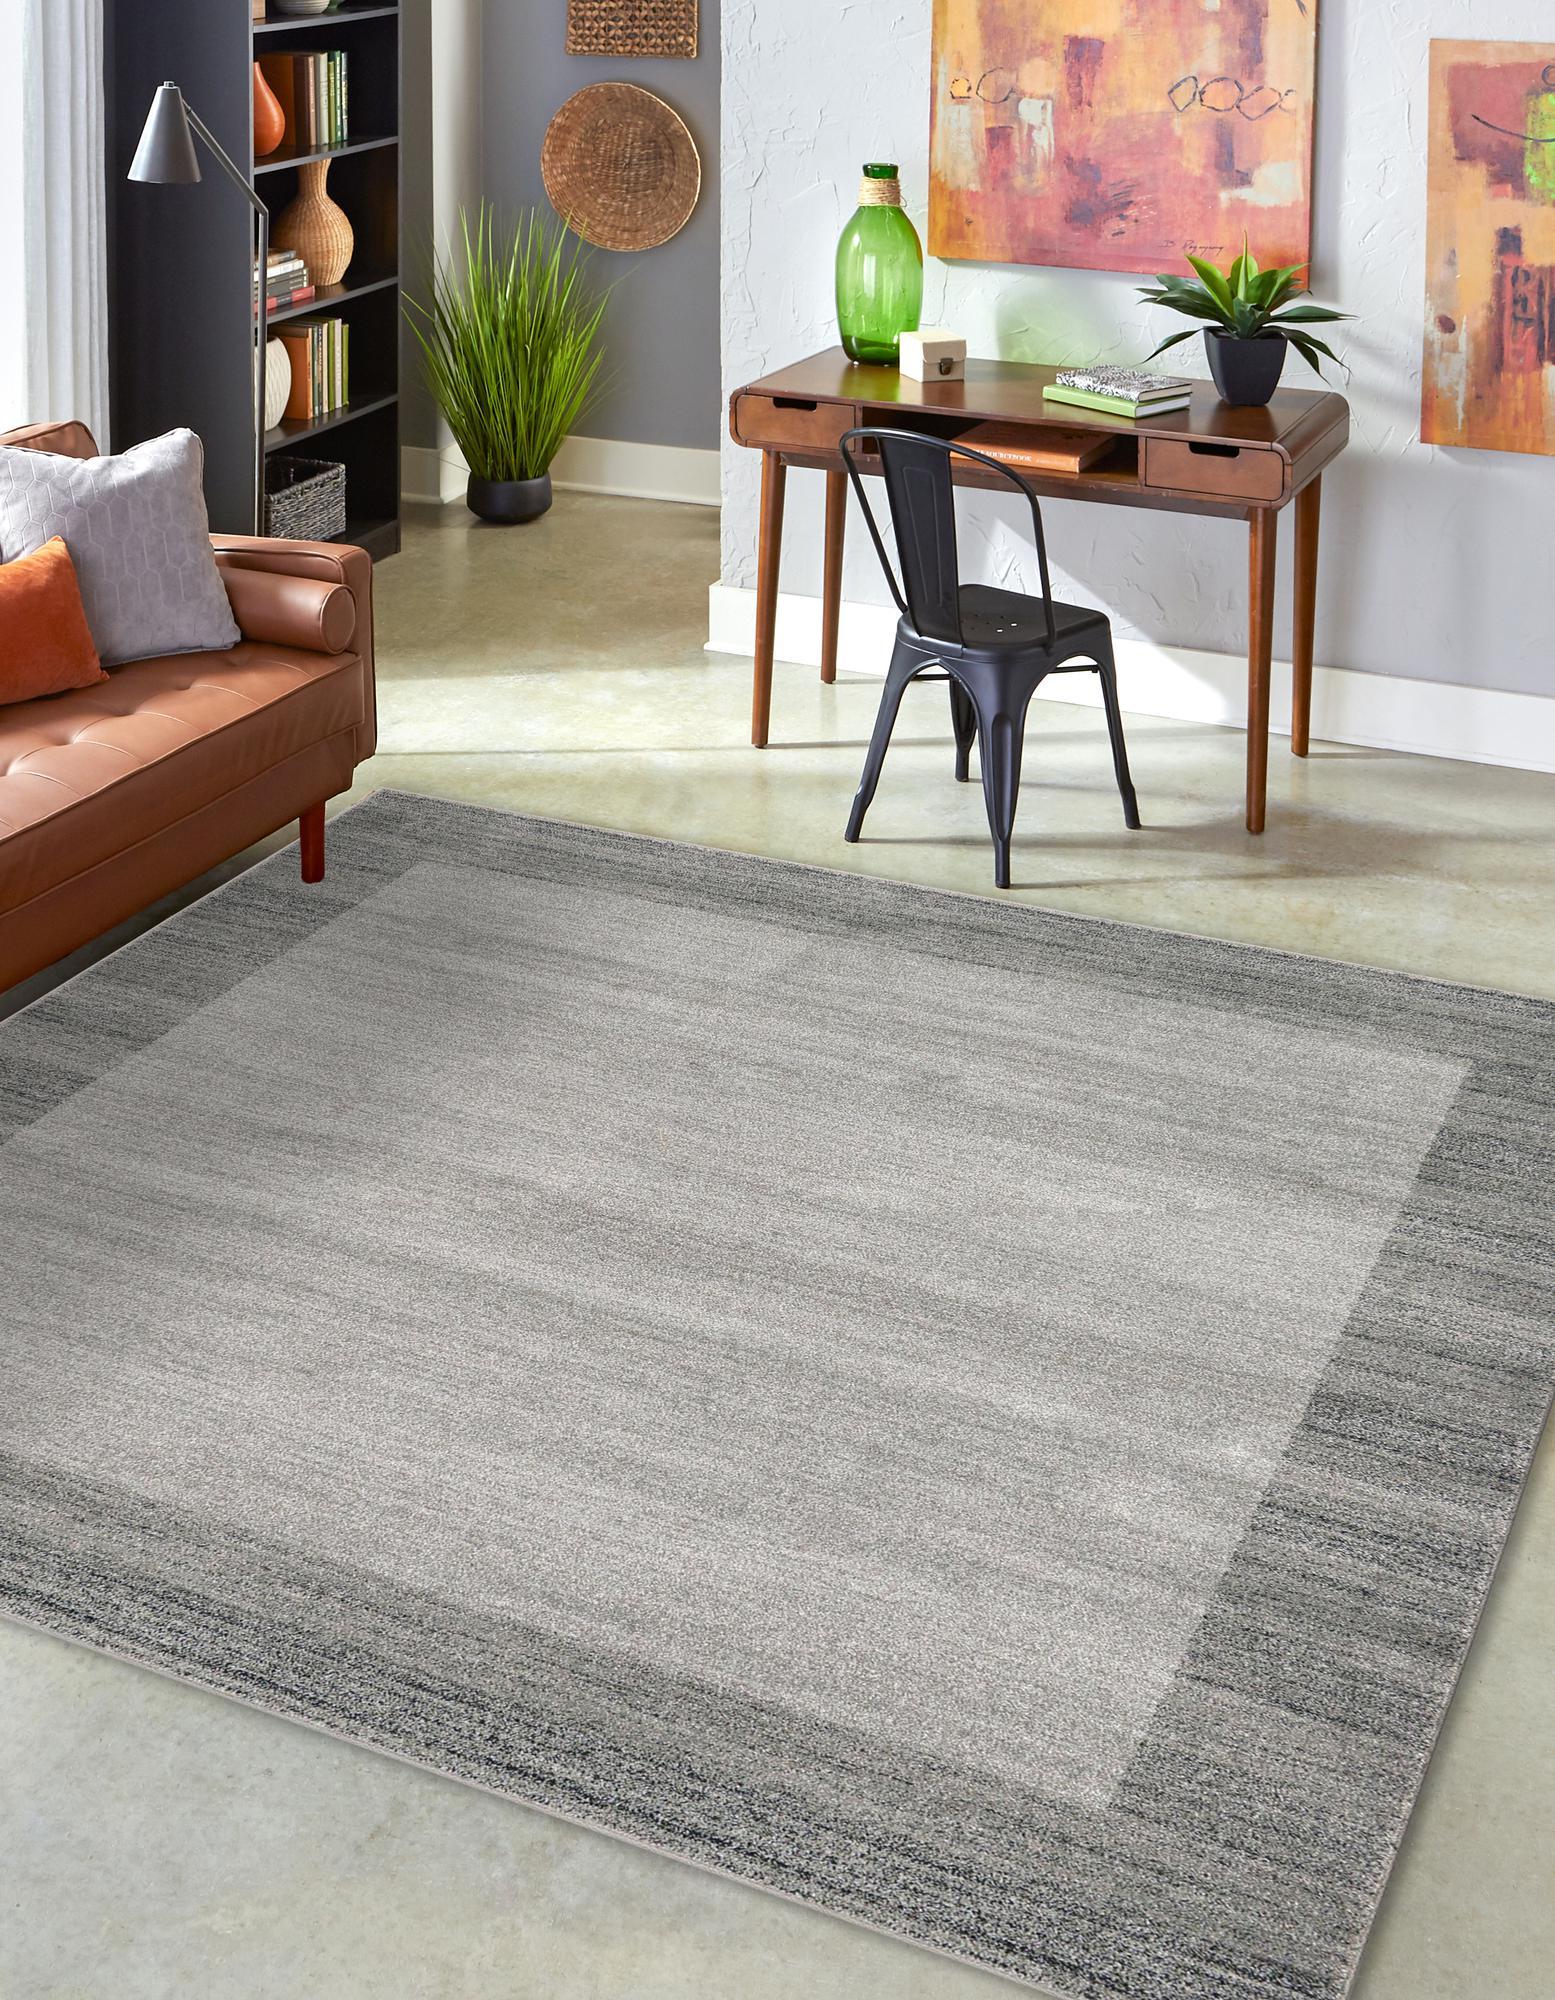 8 x 8 loft square rug